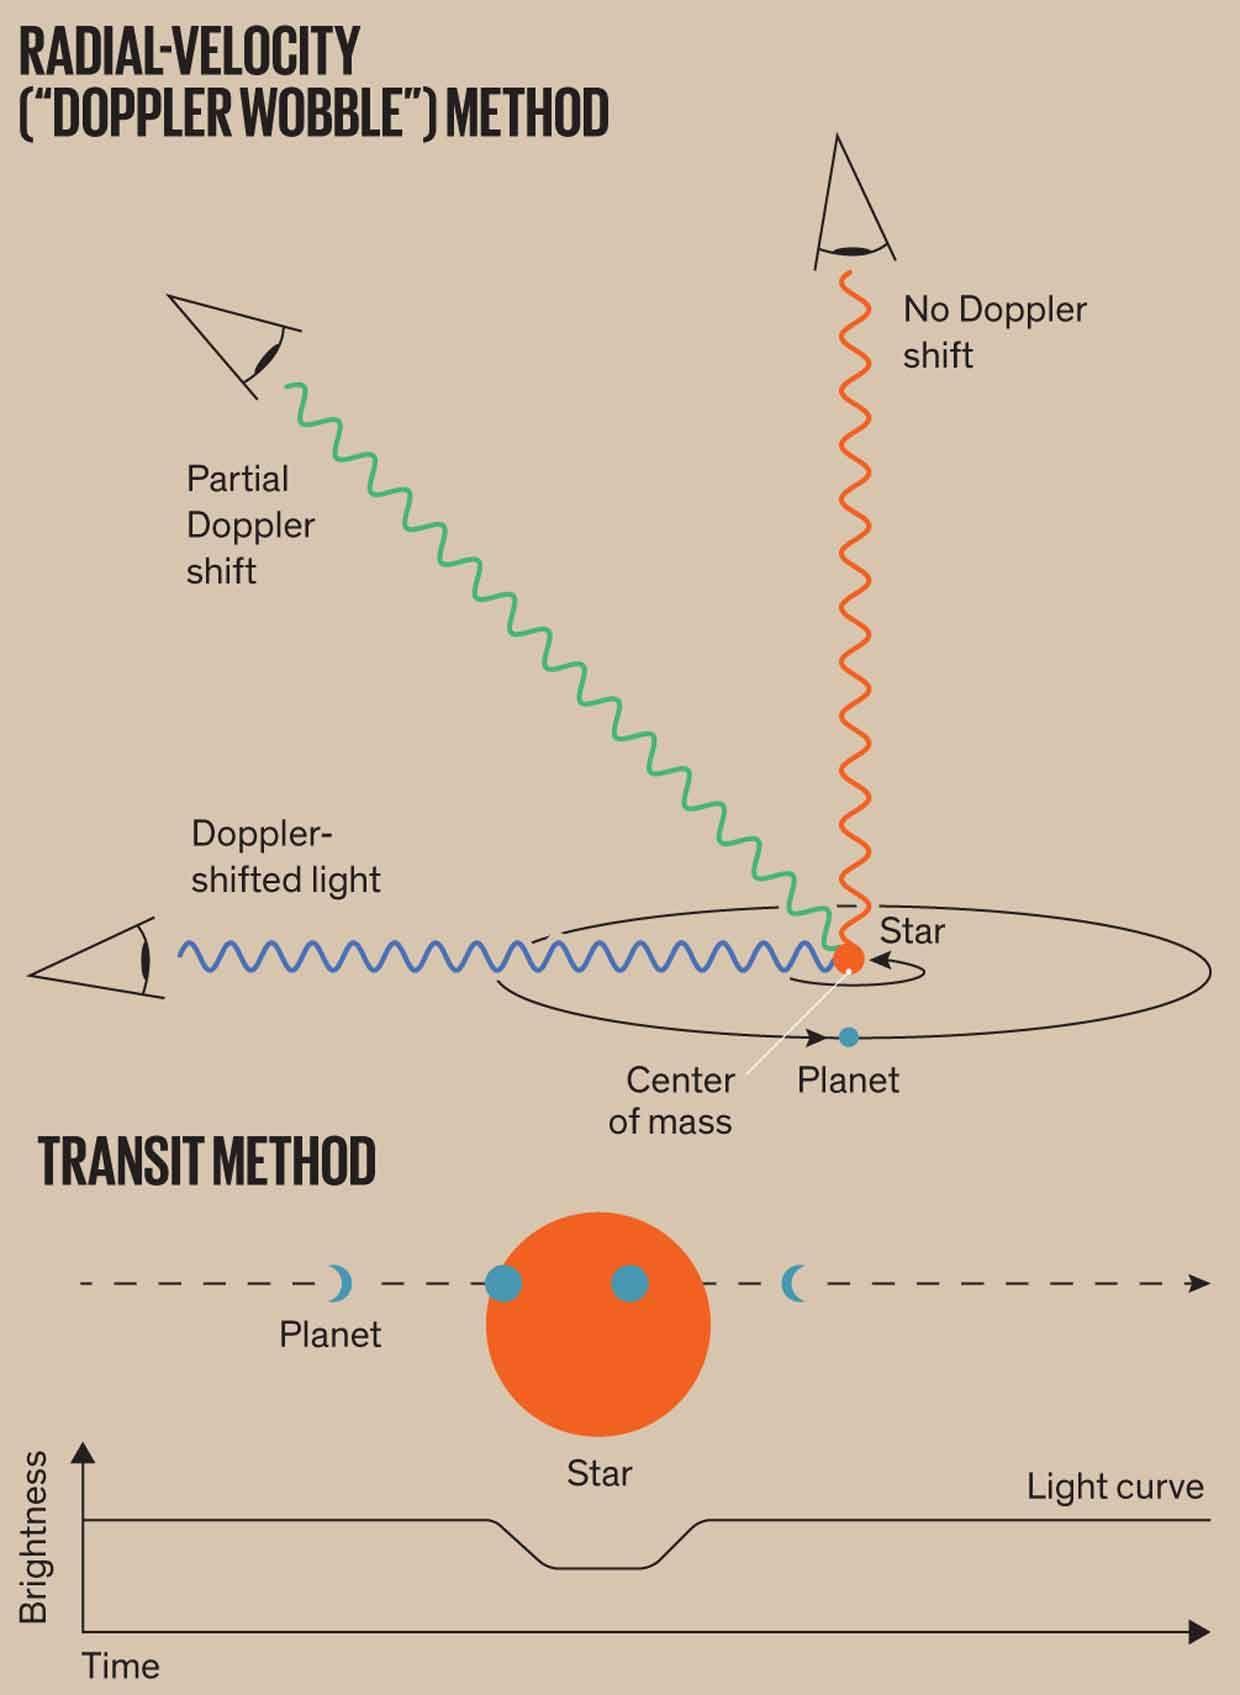 Illustration of radial-velocity vs transit method.